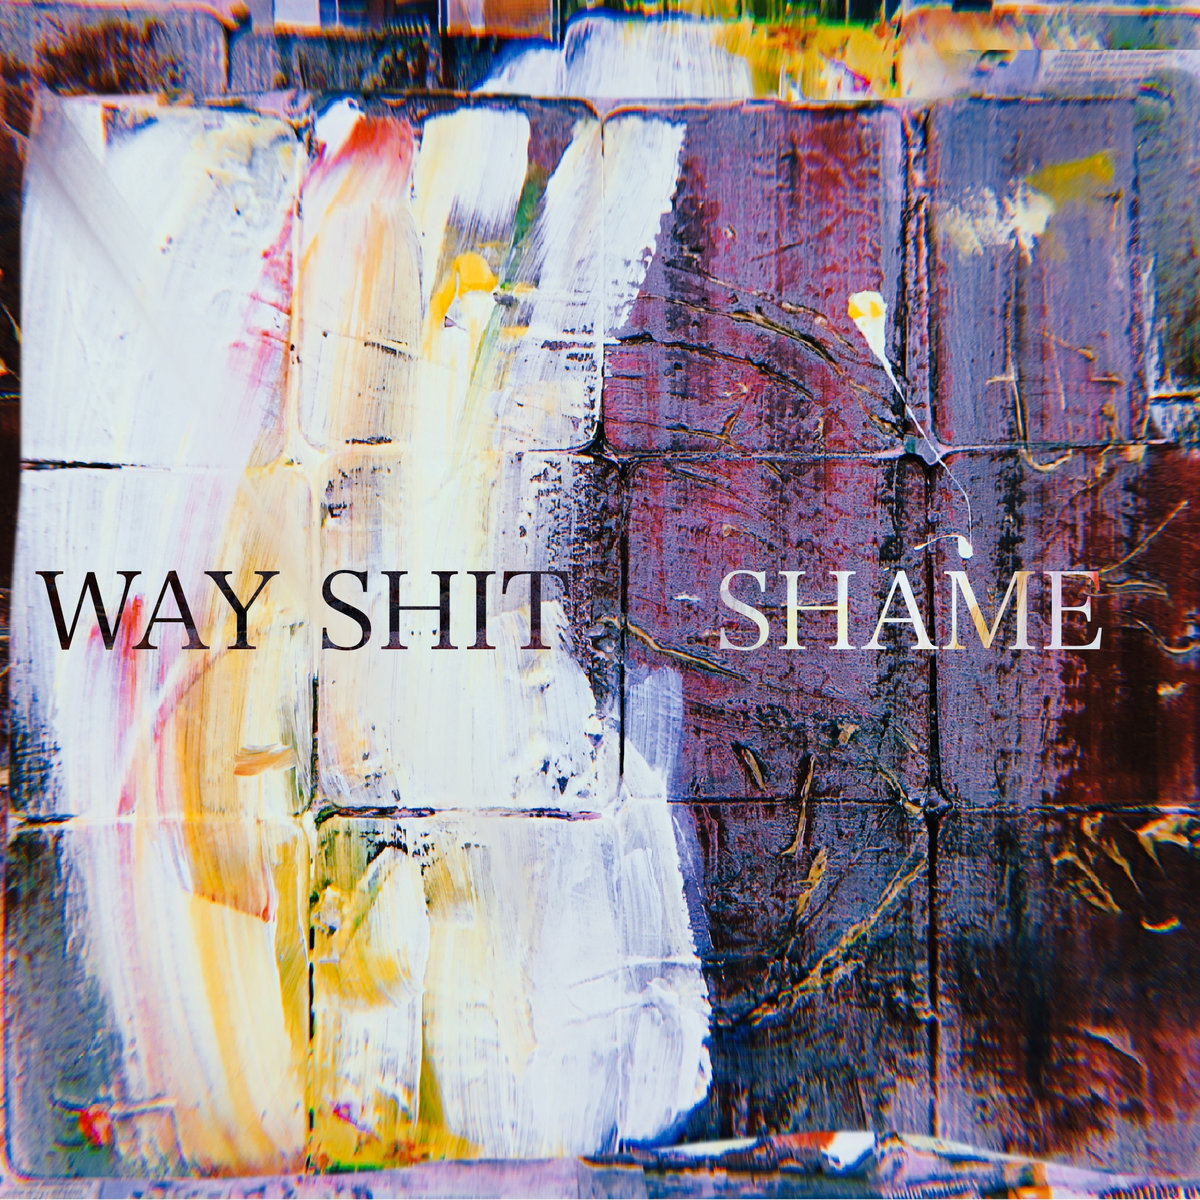 Way Shit - Shame